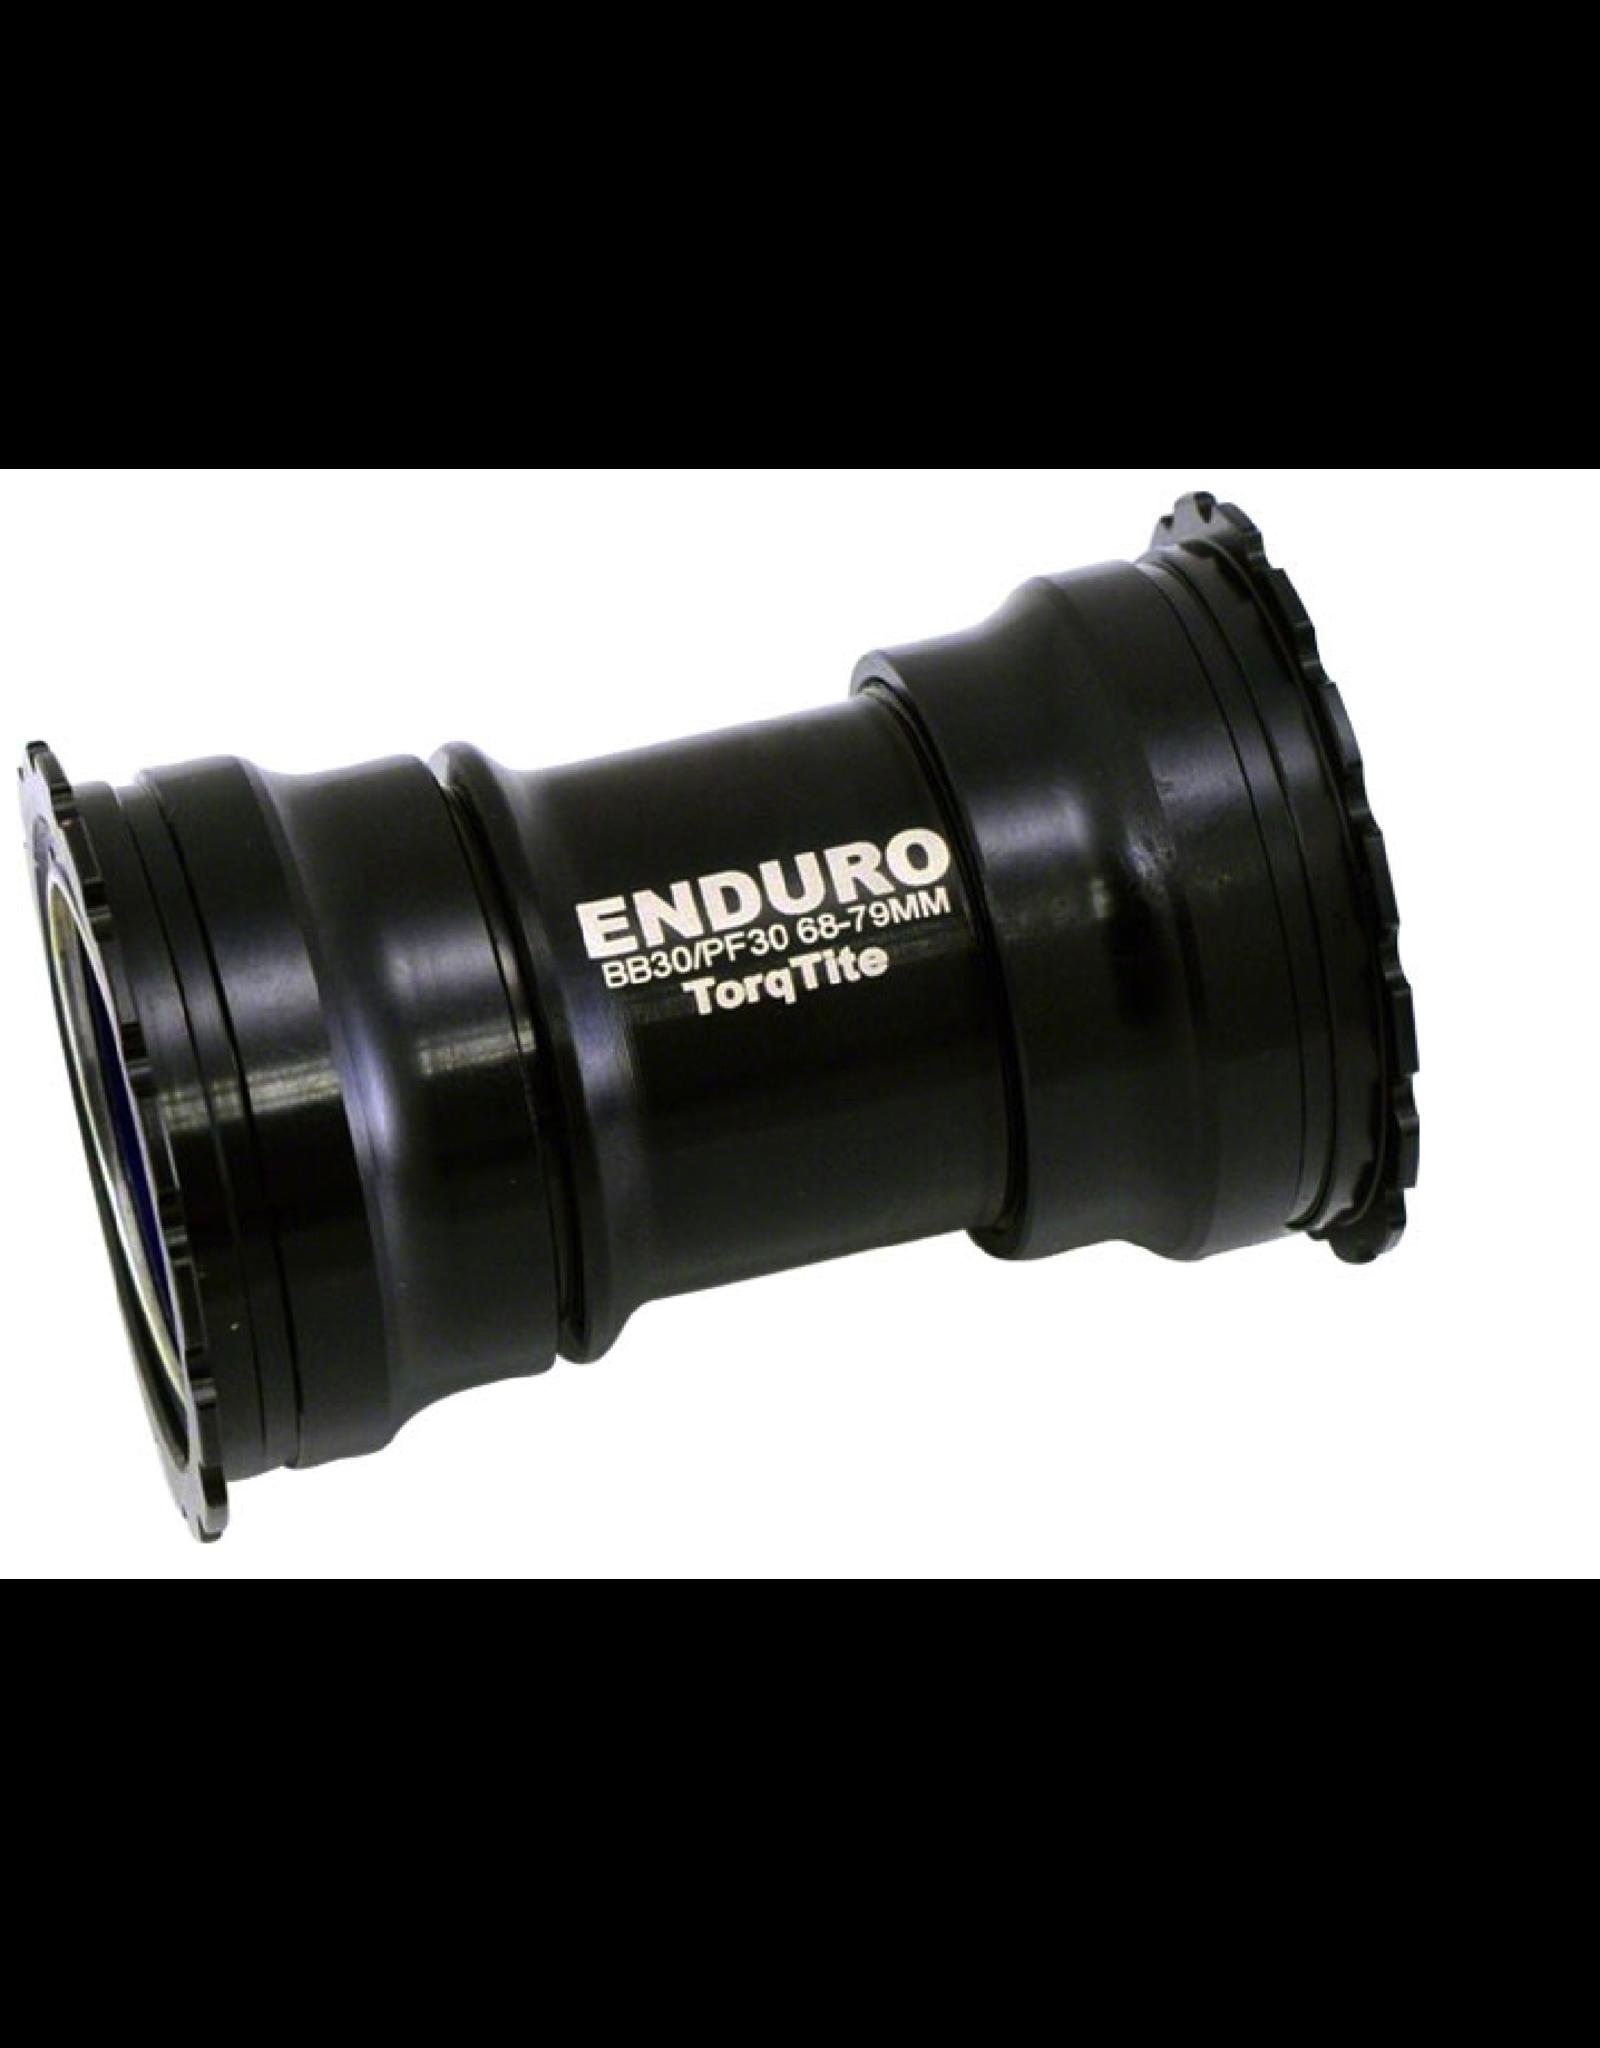 Enduro TorqTite Stainless Steel Angular Contact  PF30 Bottom Bracket, BBRight, Black